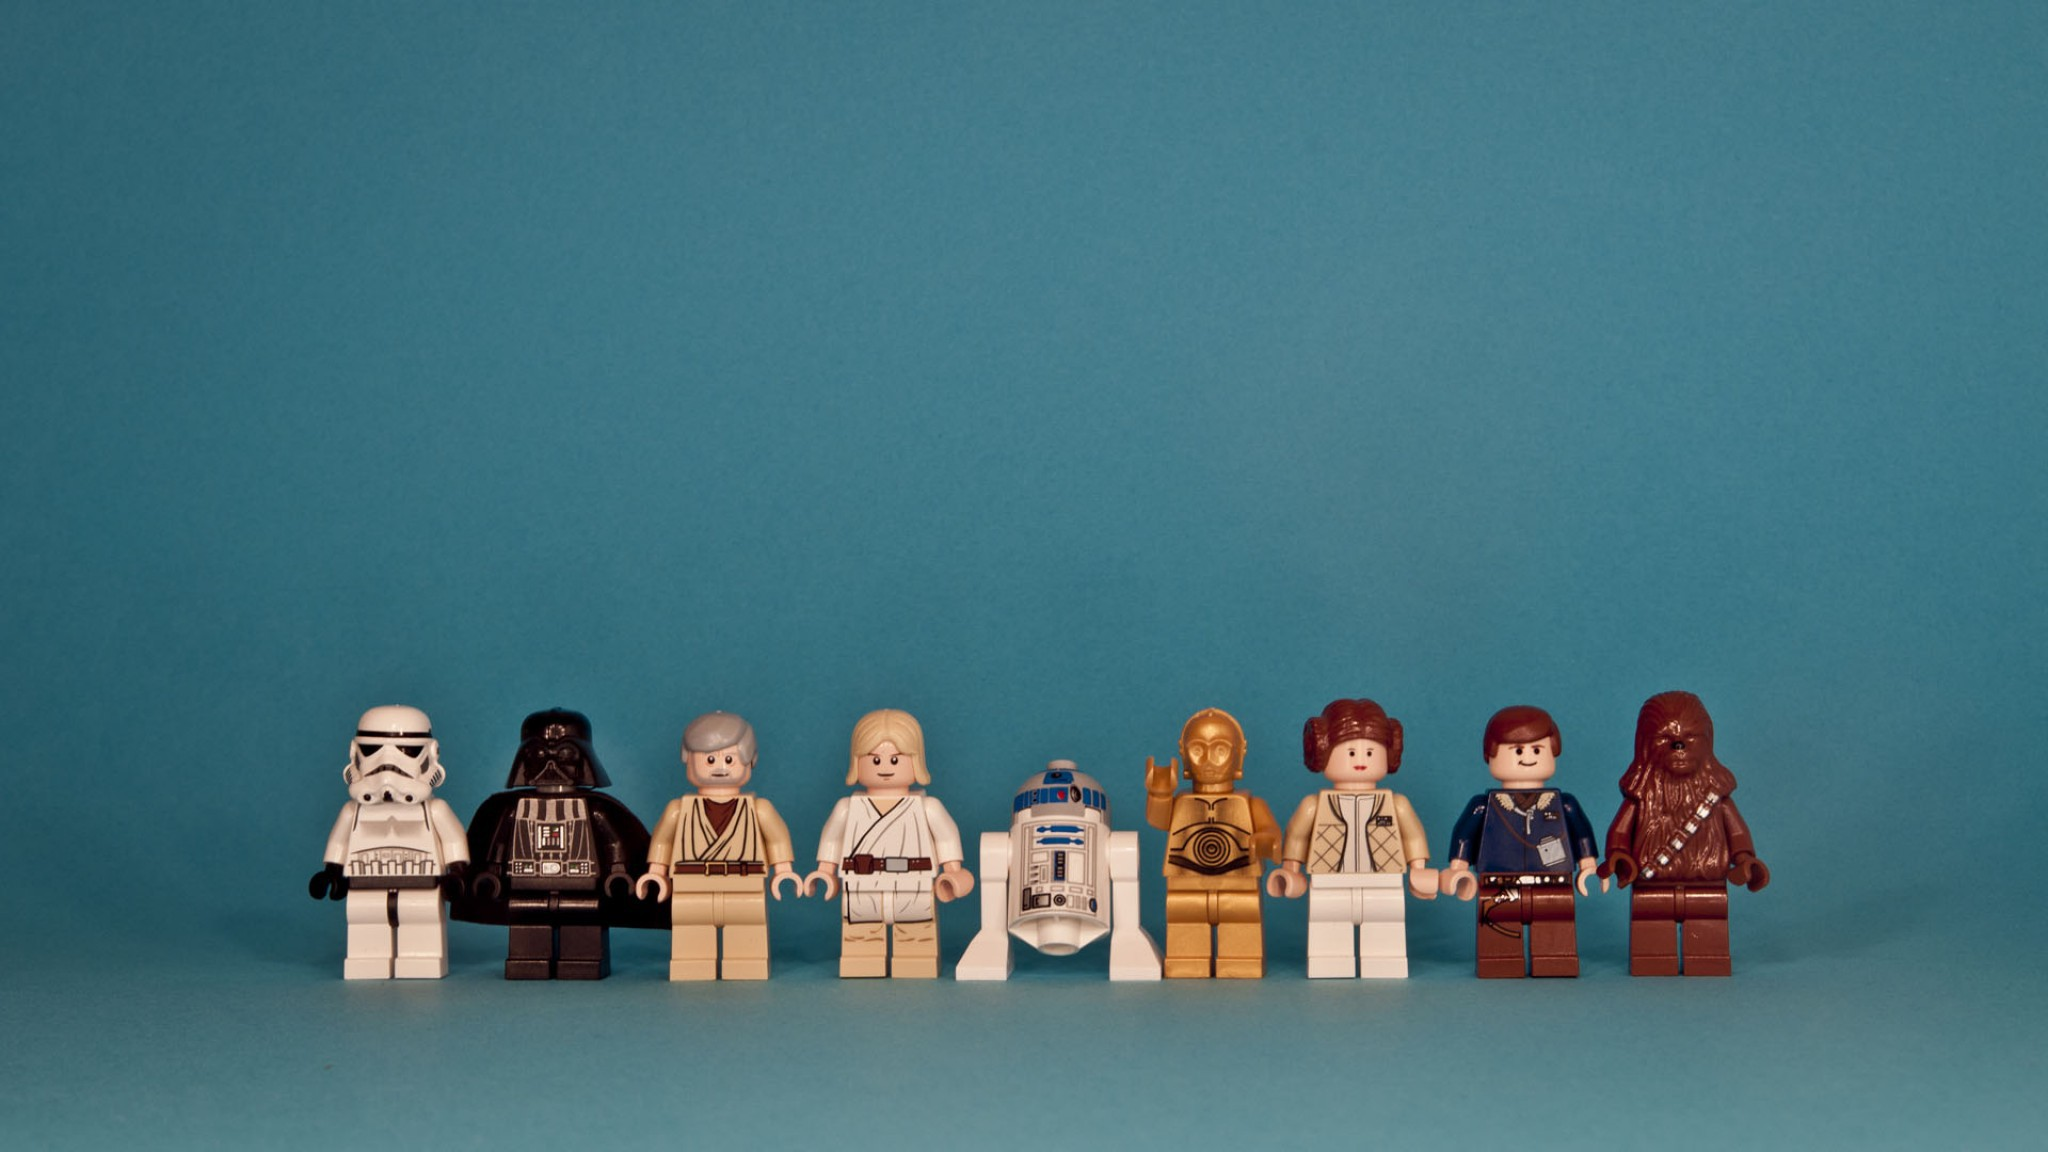 Lego Star War Wallpaper Posted By Zoey Peltier